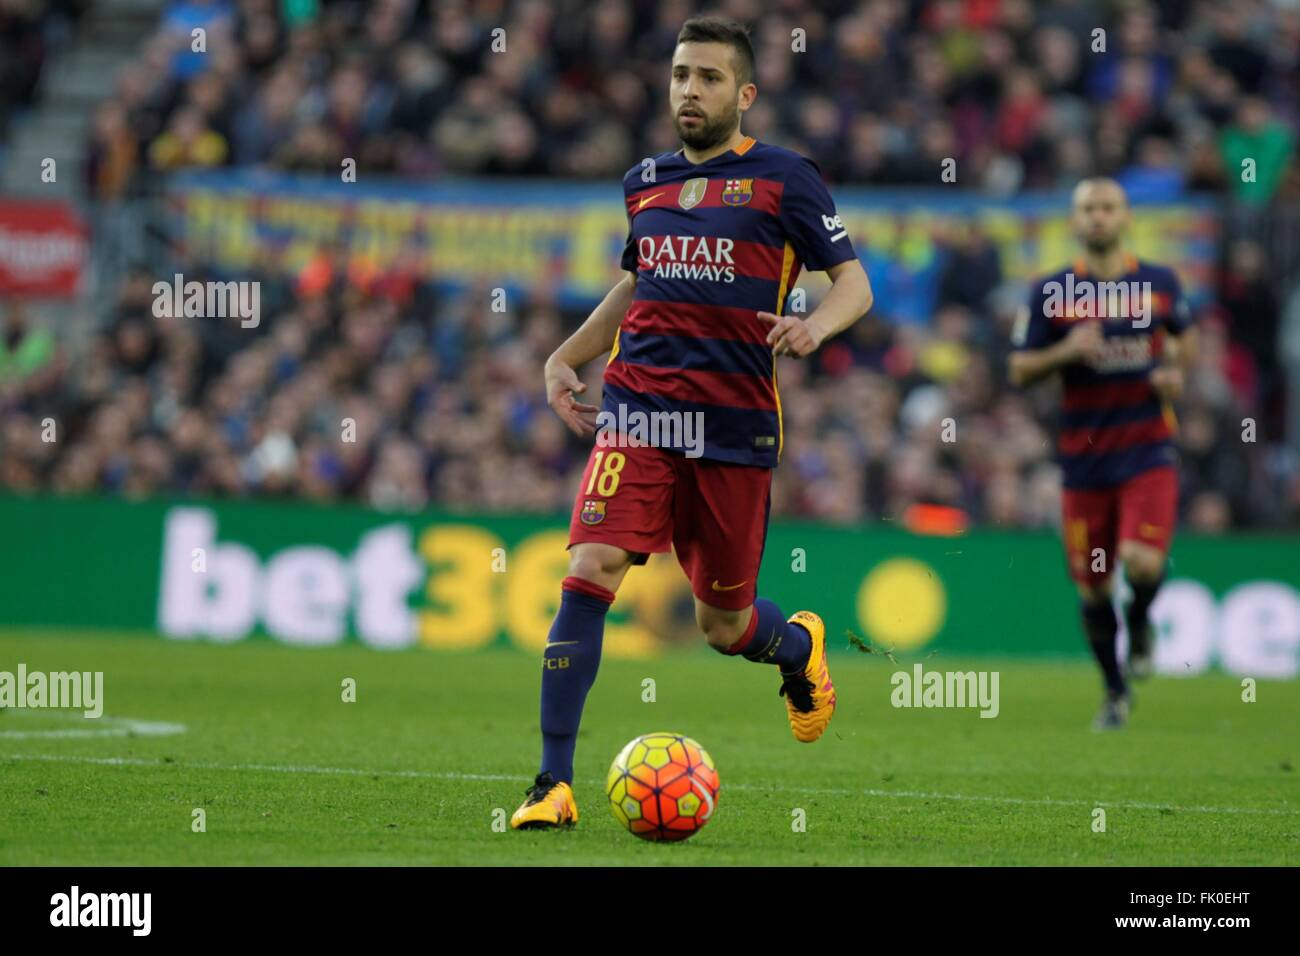 Jordi Alba in action during the La Liga match FC Barcelona